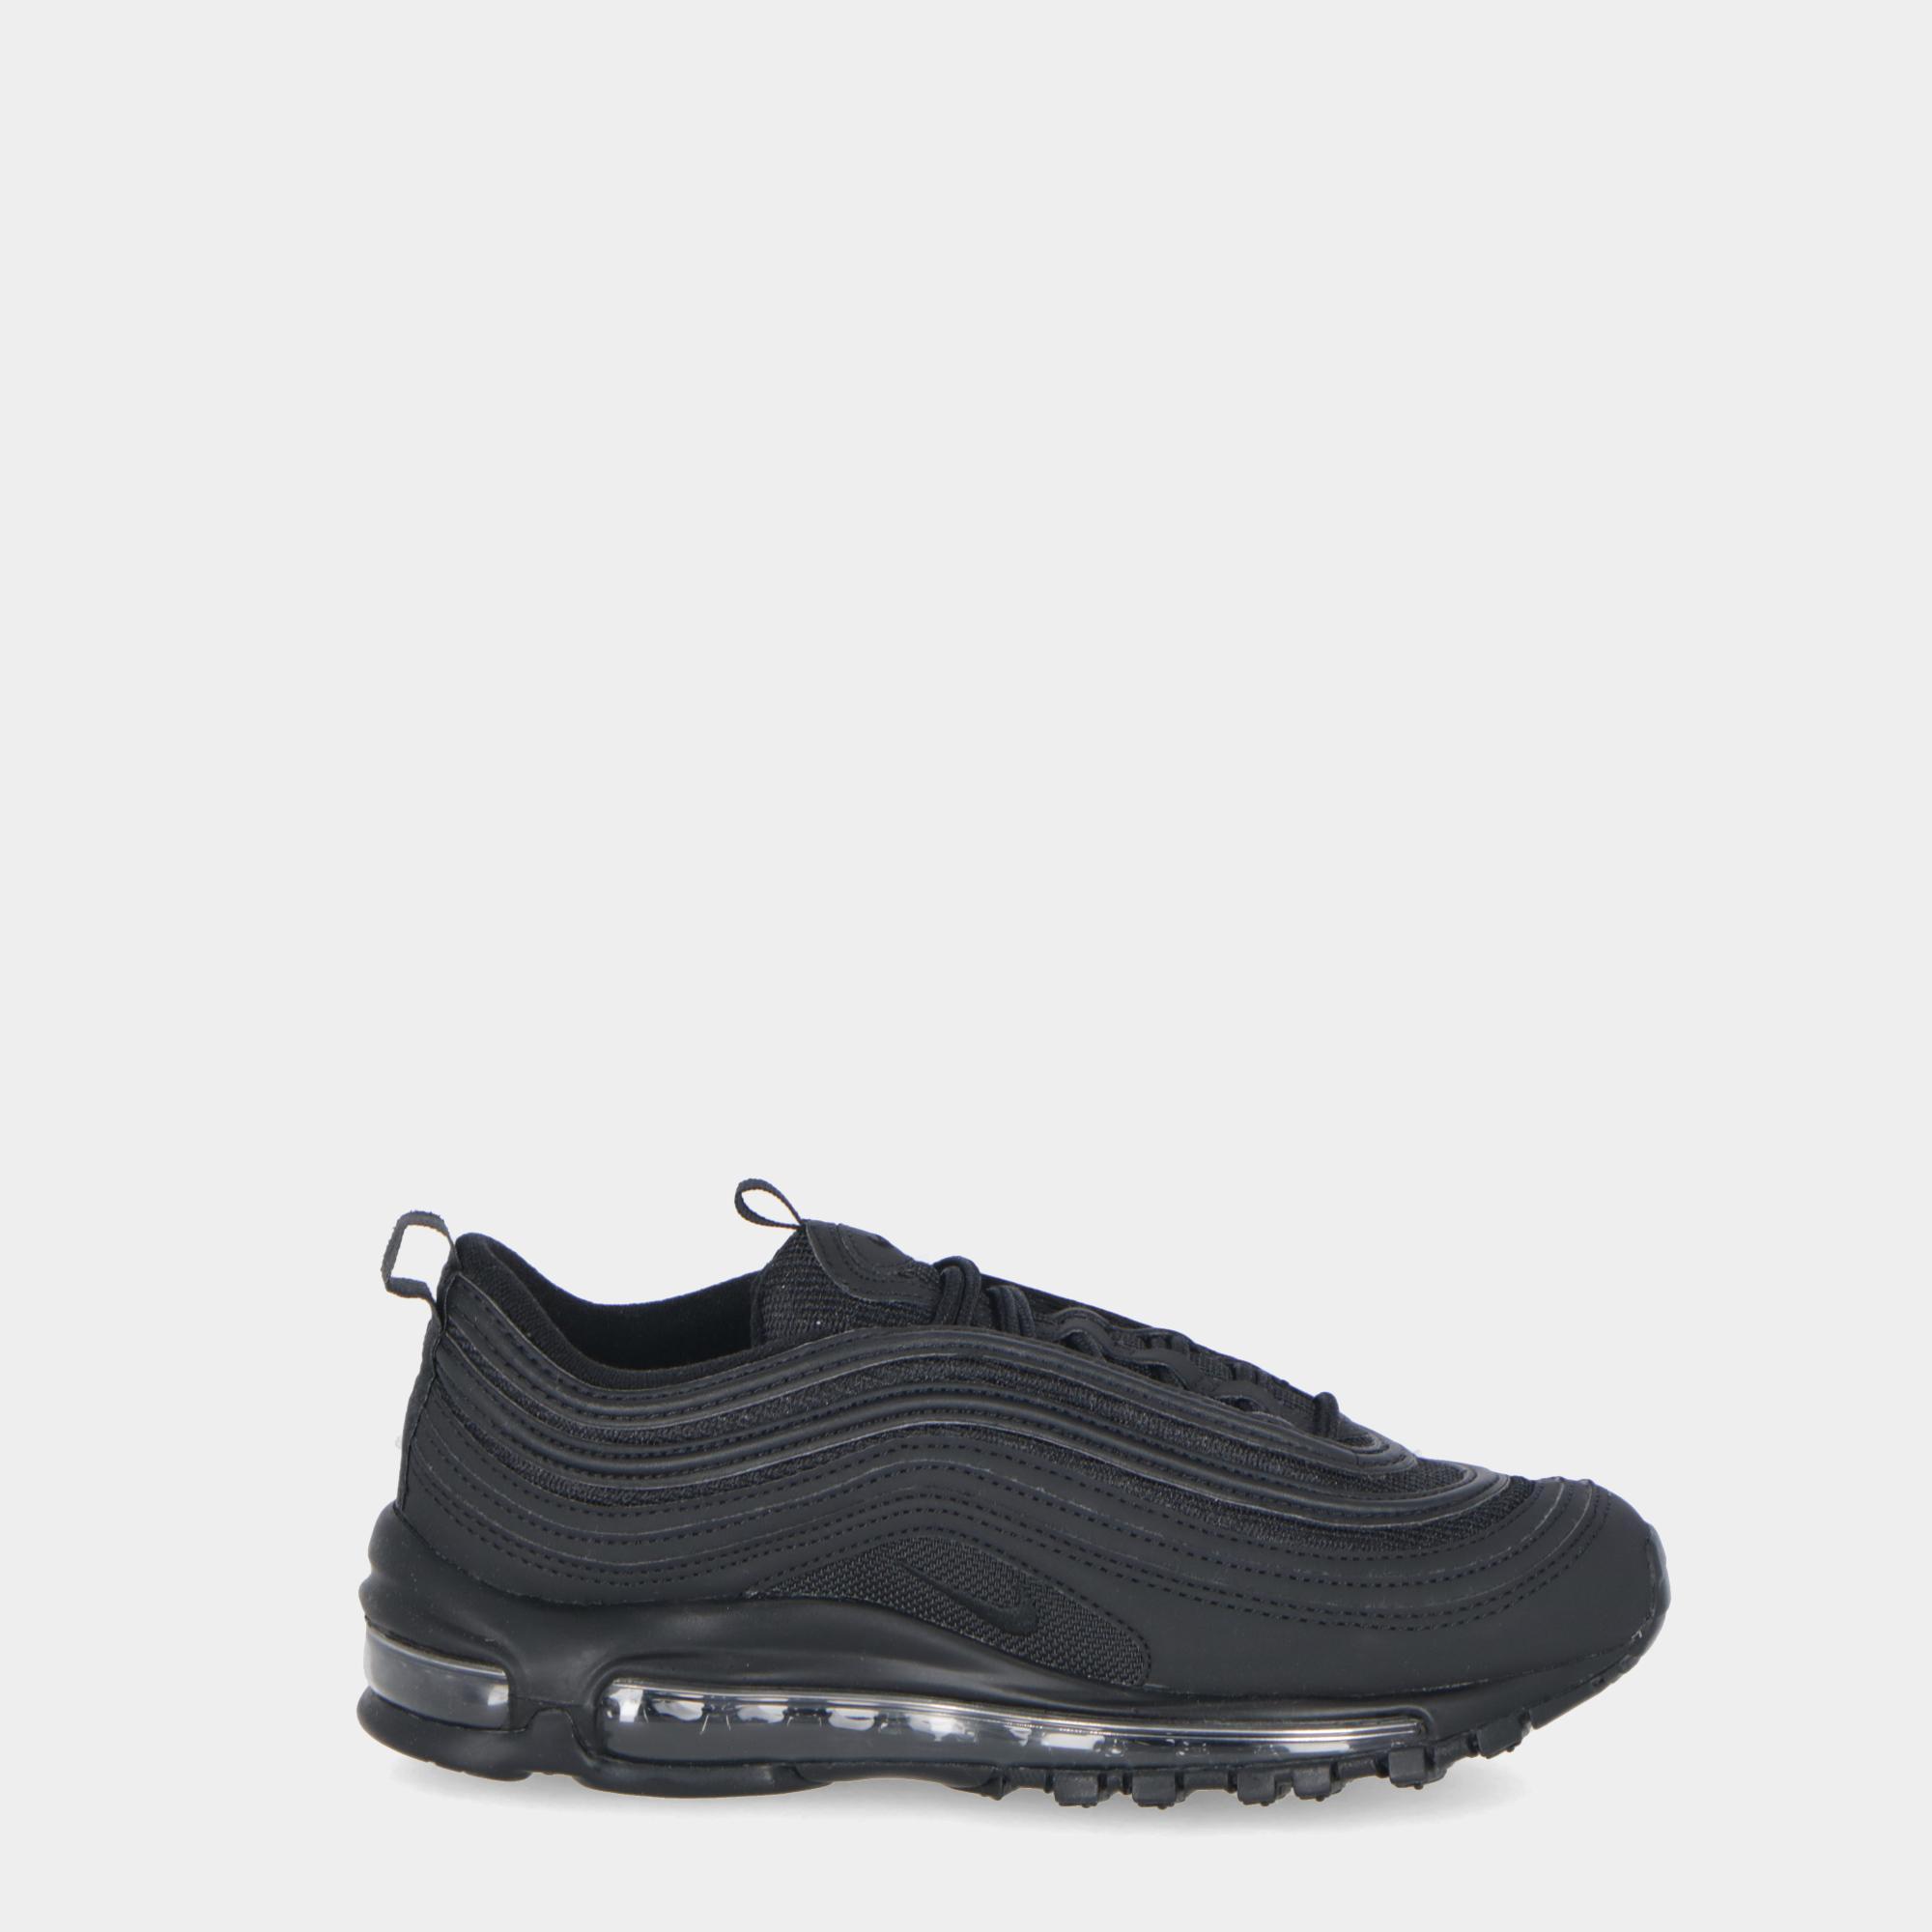 timeless design 99fc6 b511a Nike Air Max 97 Og (gs) - Kids Black black